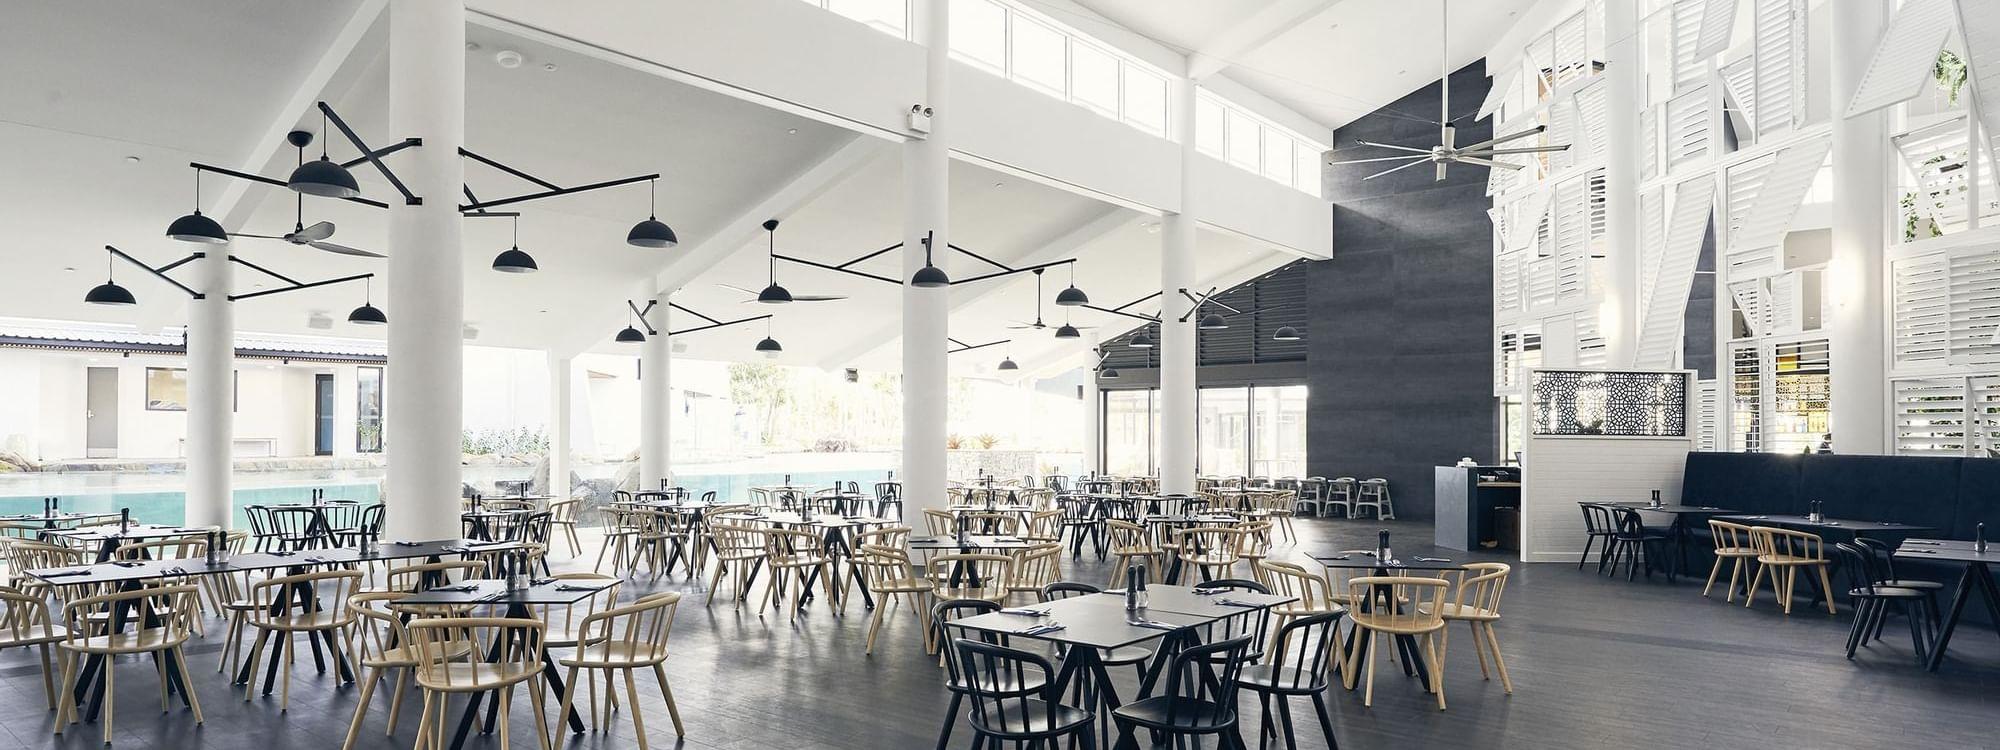 Dining tables in Graze Restaurant at Daydream Island Resort